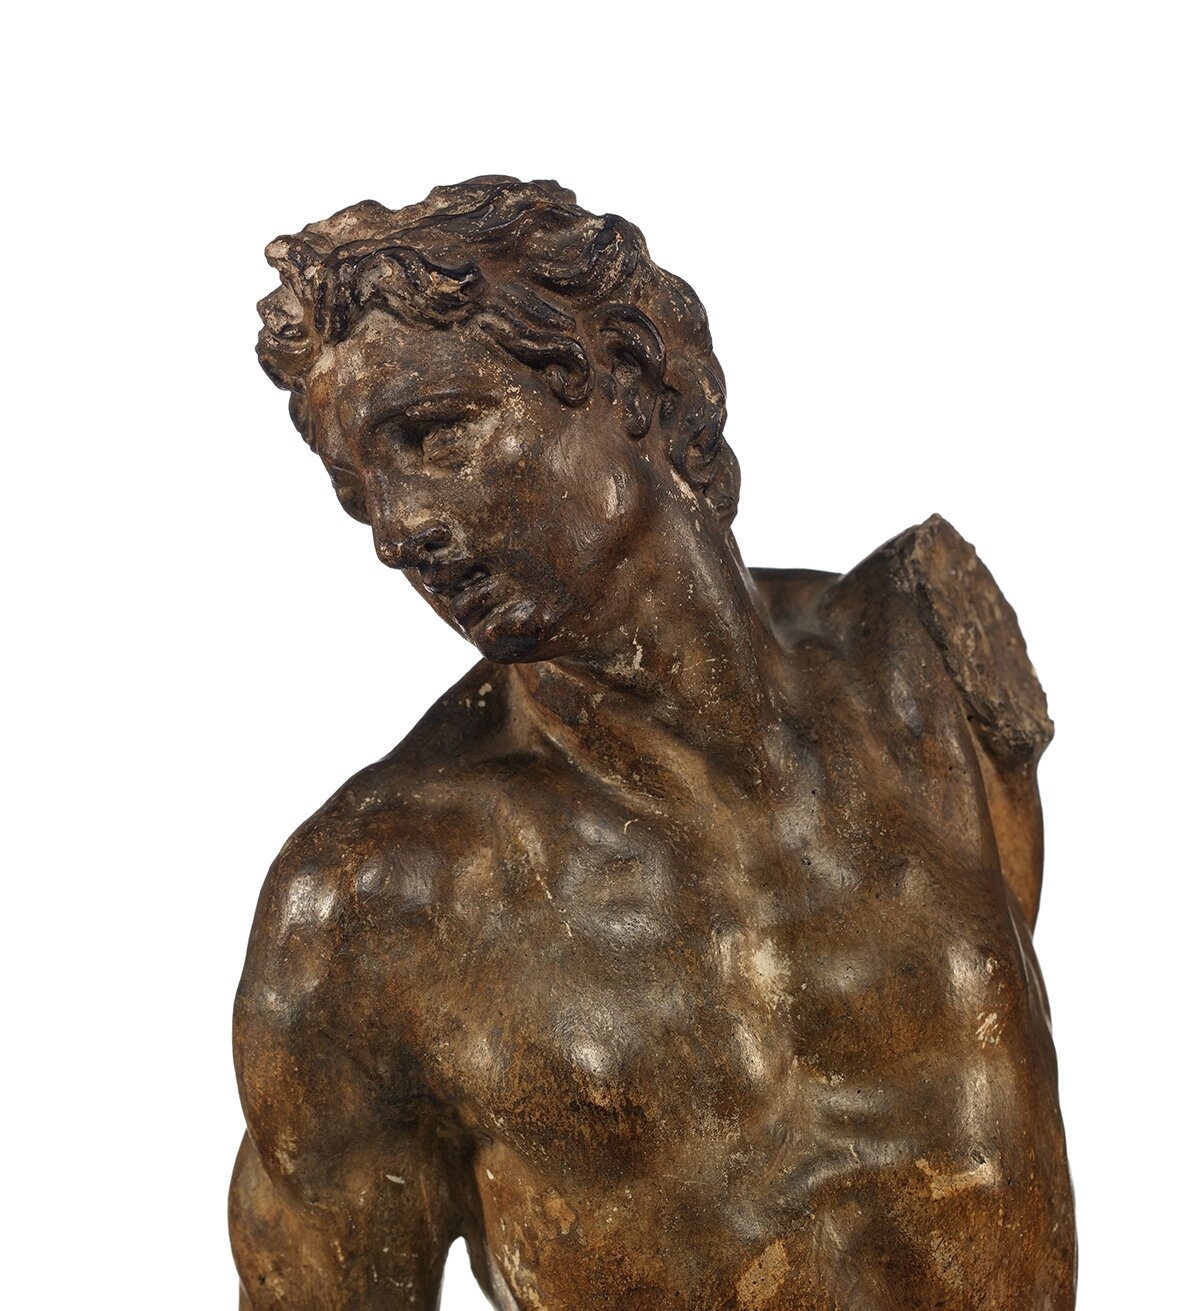 Saint Sébastien, Attribué à Alessandro Vittoria (Trente, 1525 - Venise, 1608), Italie, XVIe siècle